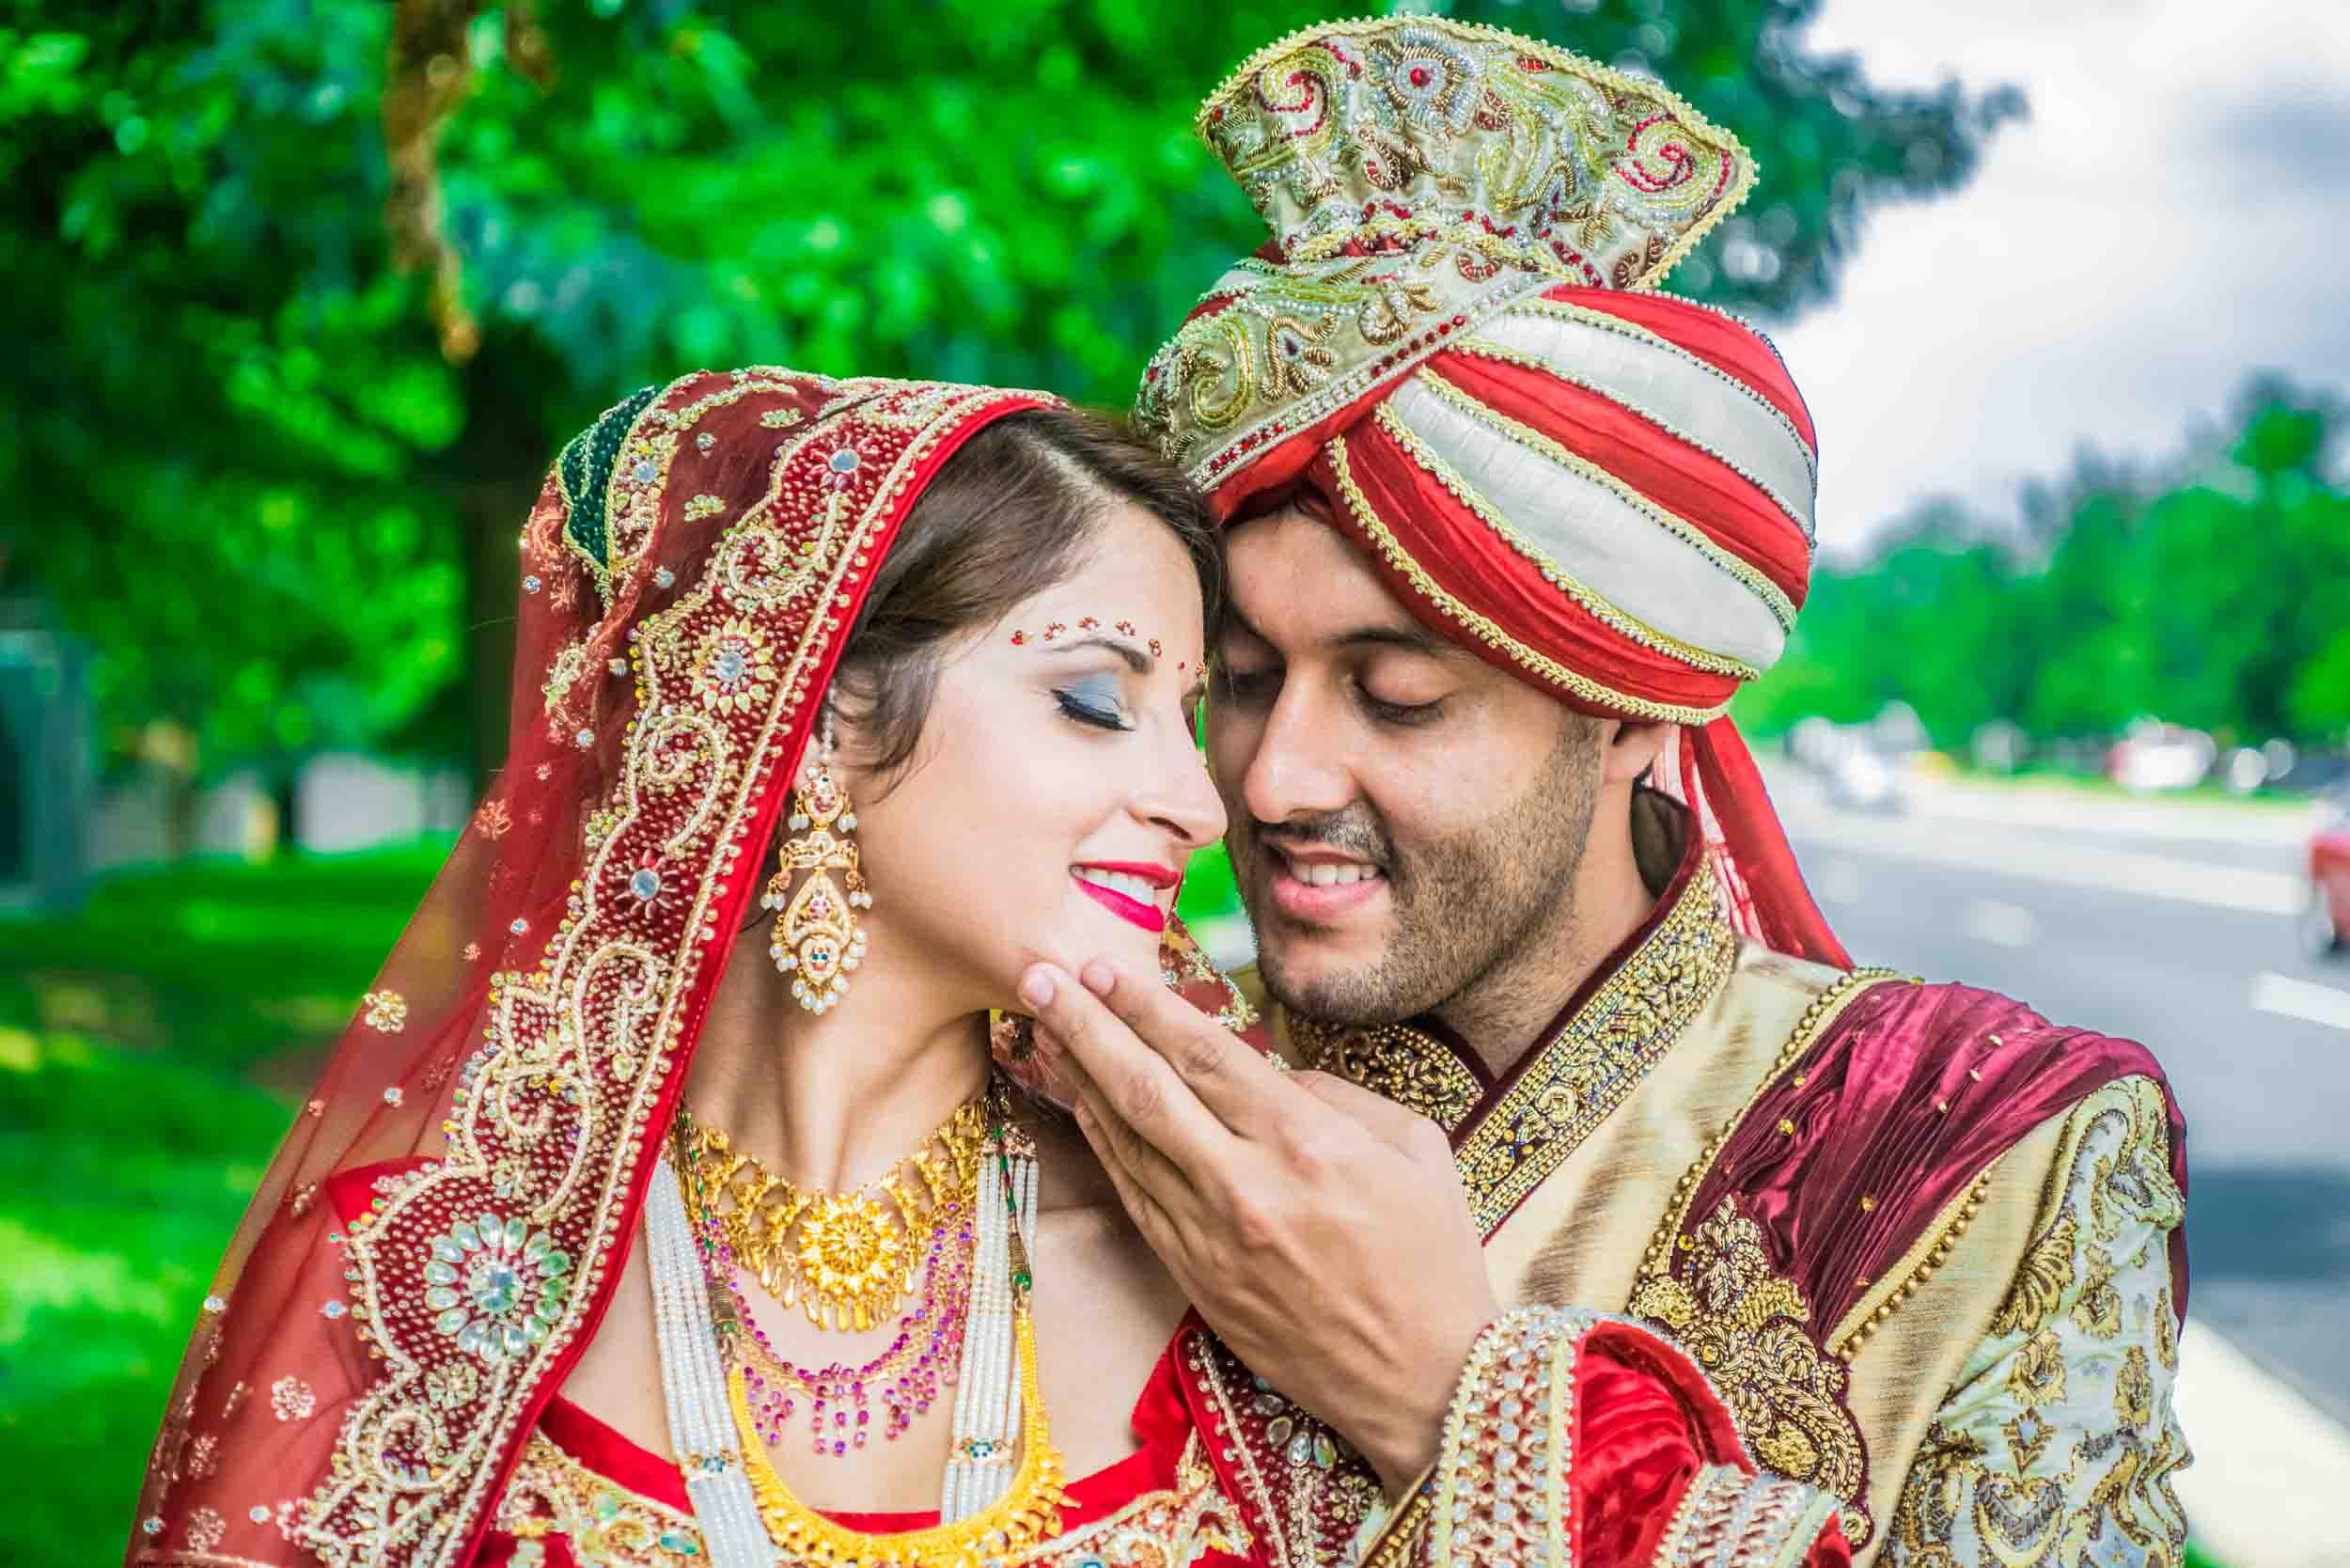 dc+metro+wedding+photographer+vadym+guliuk+photography+wedding+bride+and+groom-2040.jpg